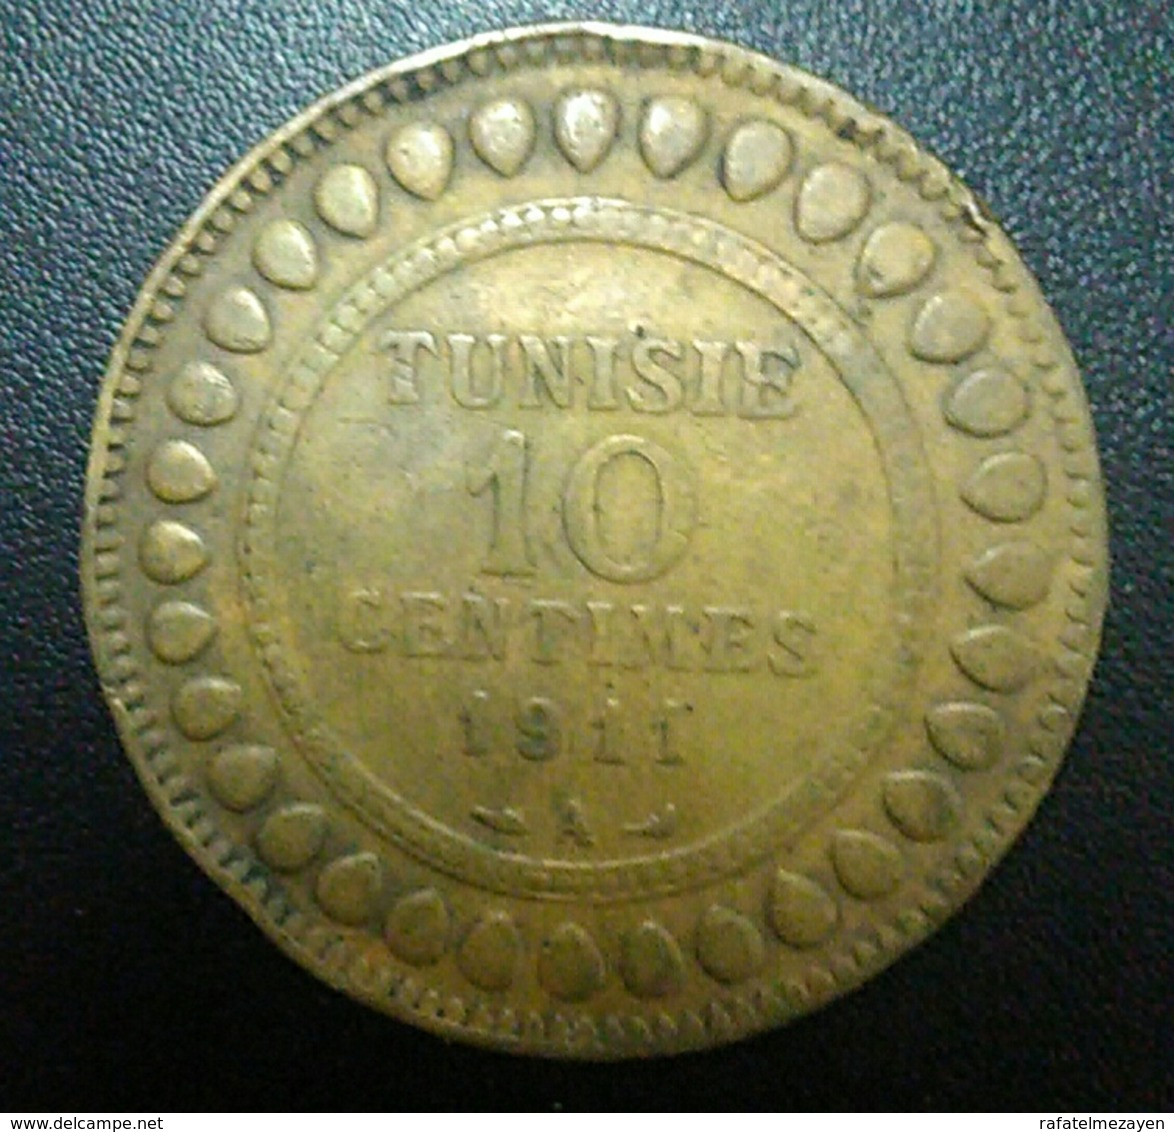 Tunisia 10 Centimes 1911 Mohammed V - Tunisie